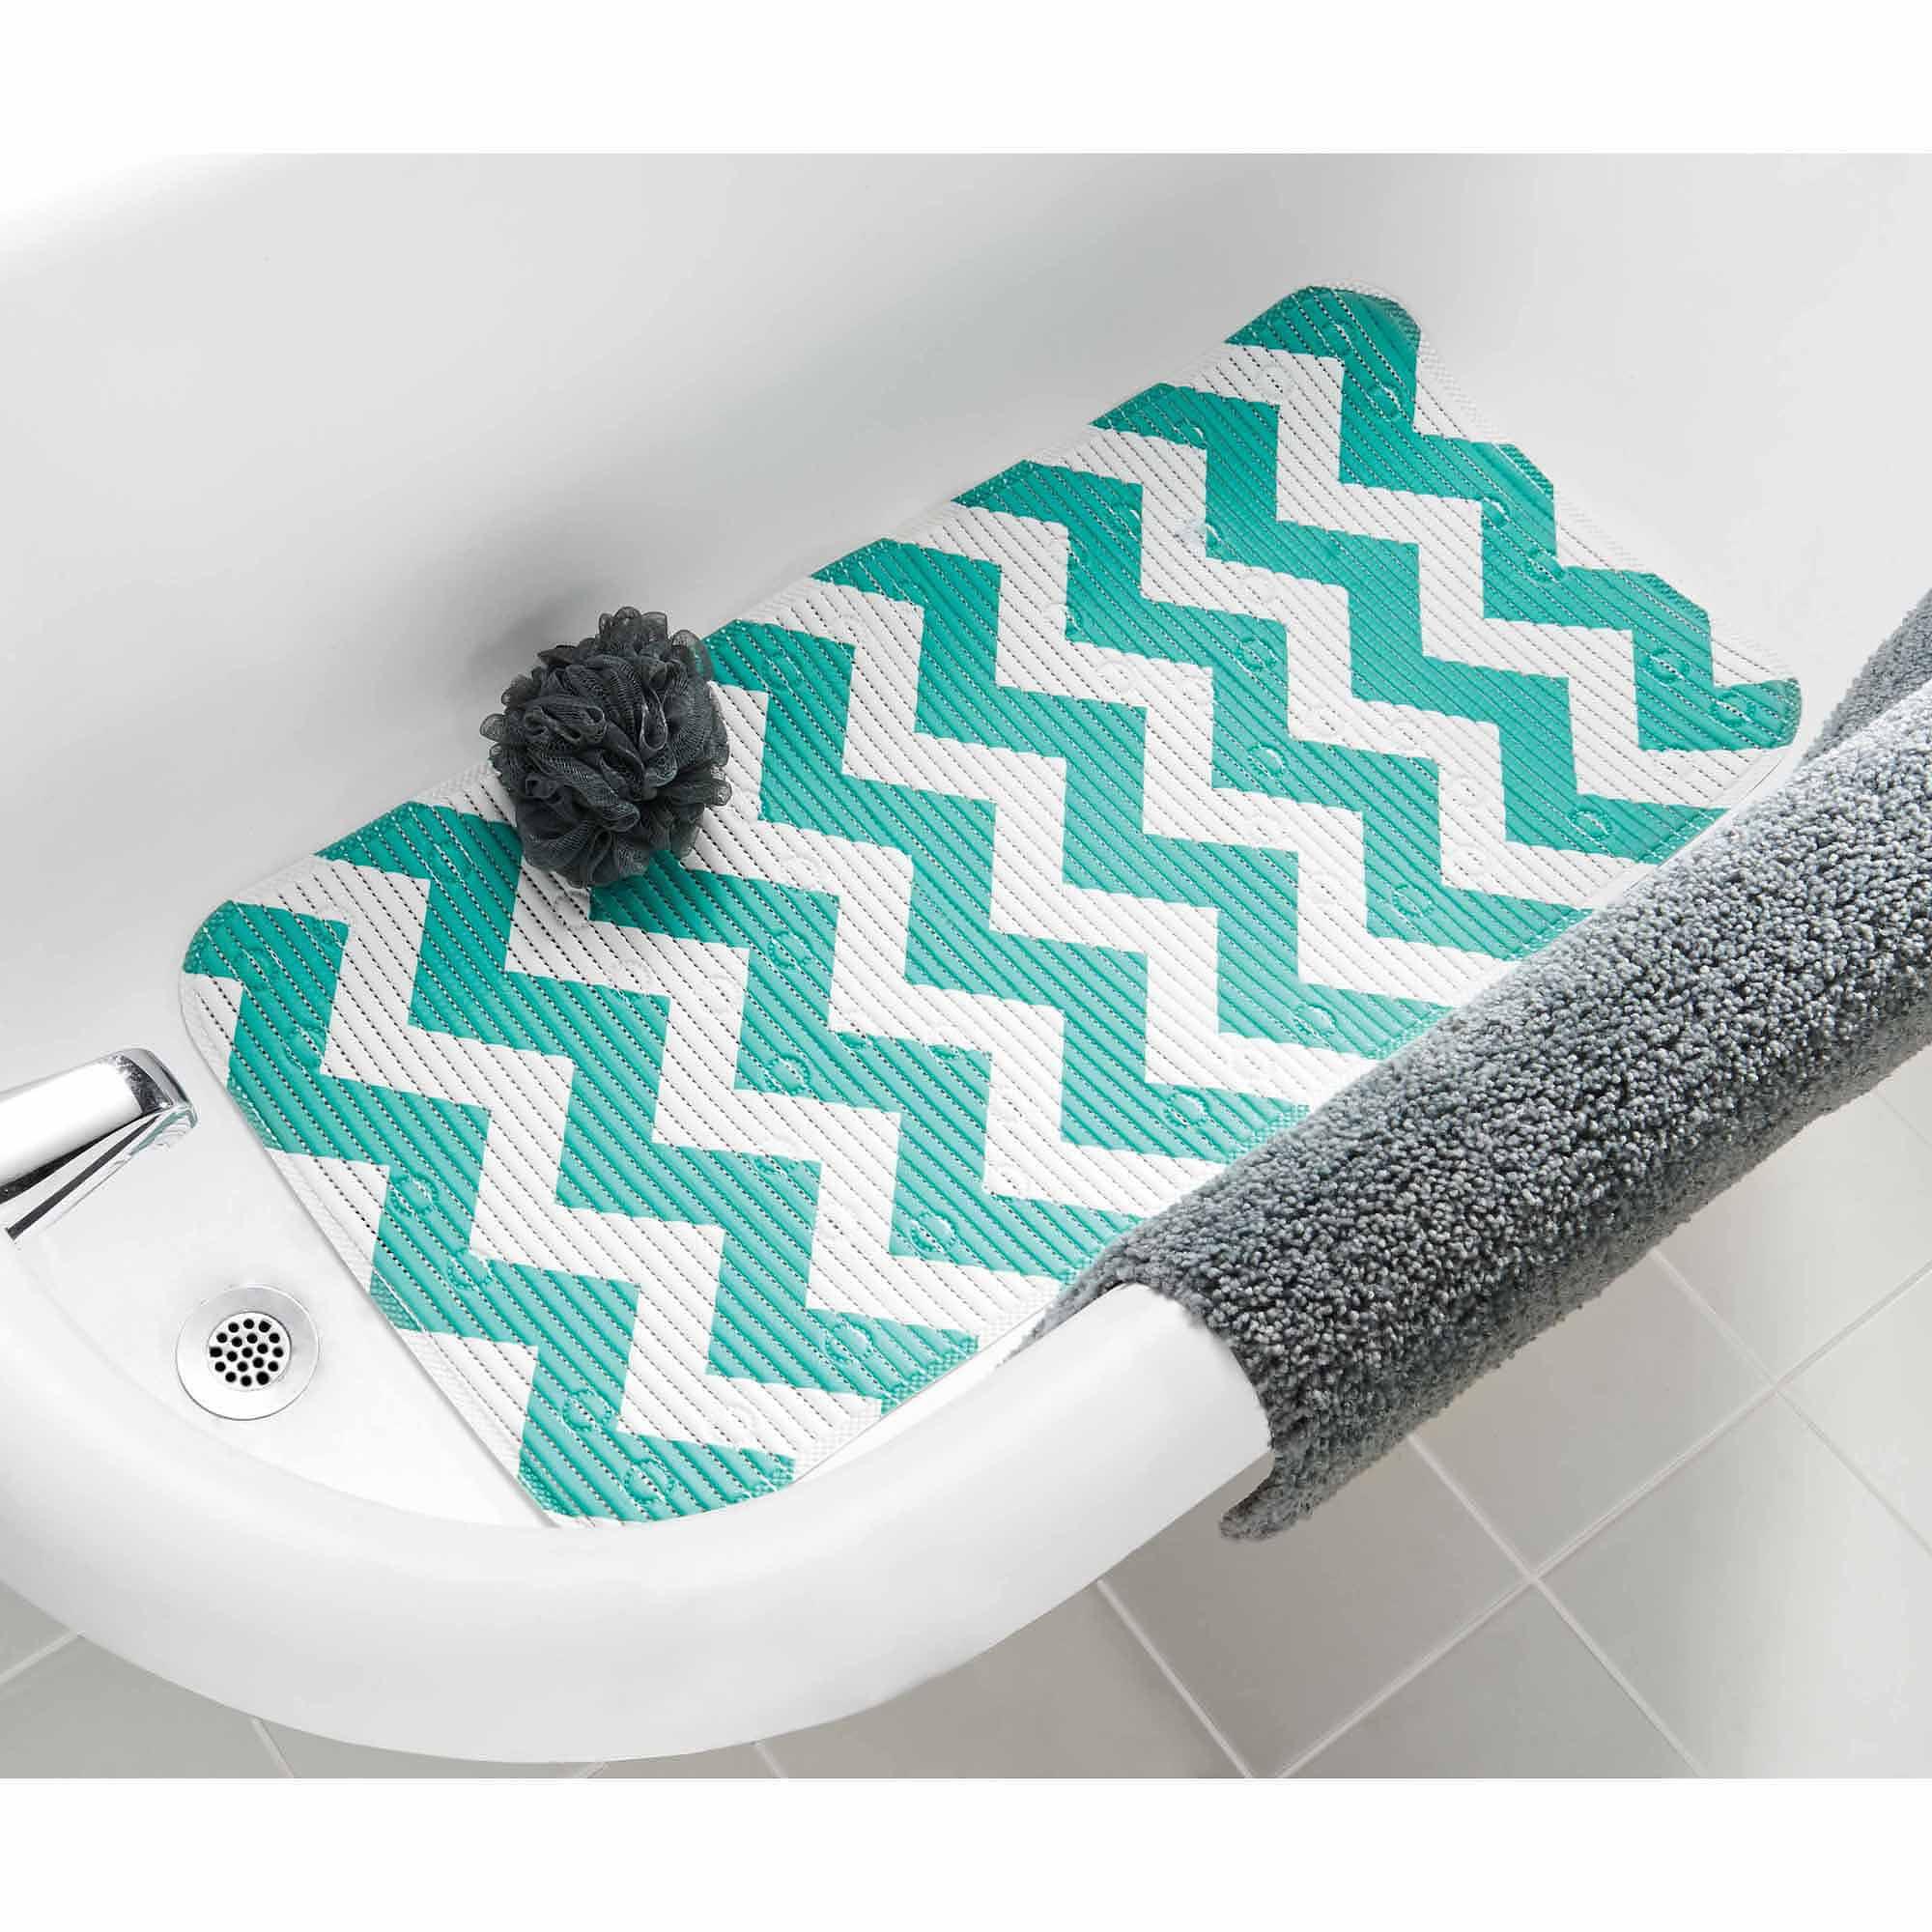 Mainstays Softex Designer Cushion Bath Mat, Chevron Teal Island ...